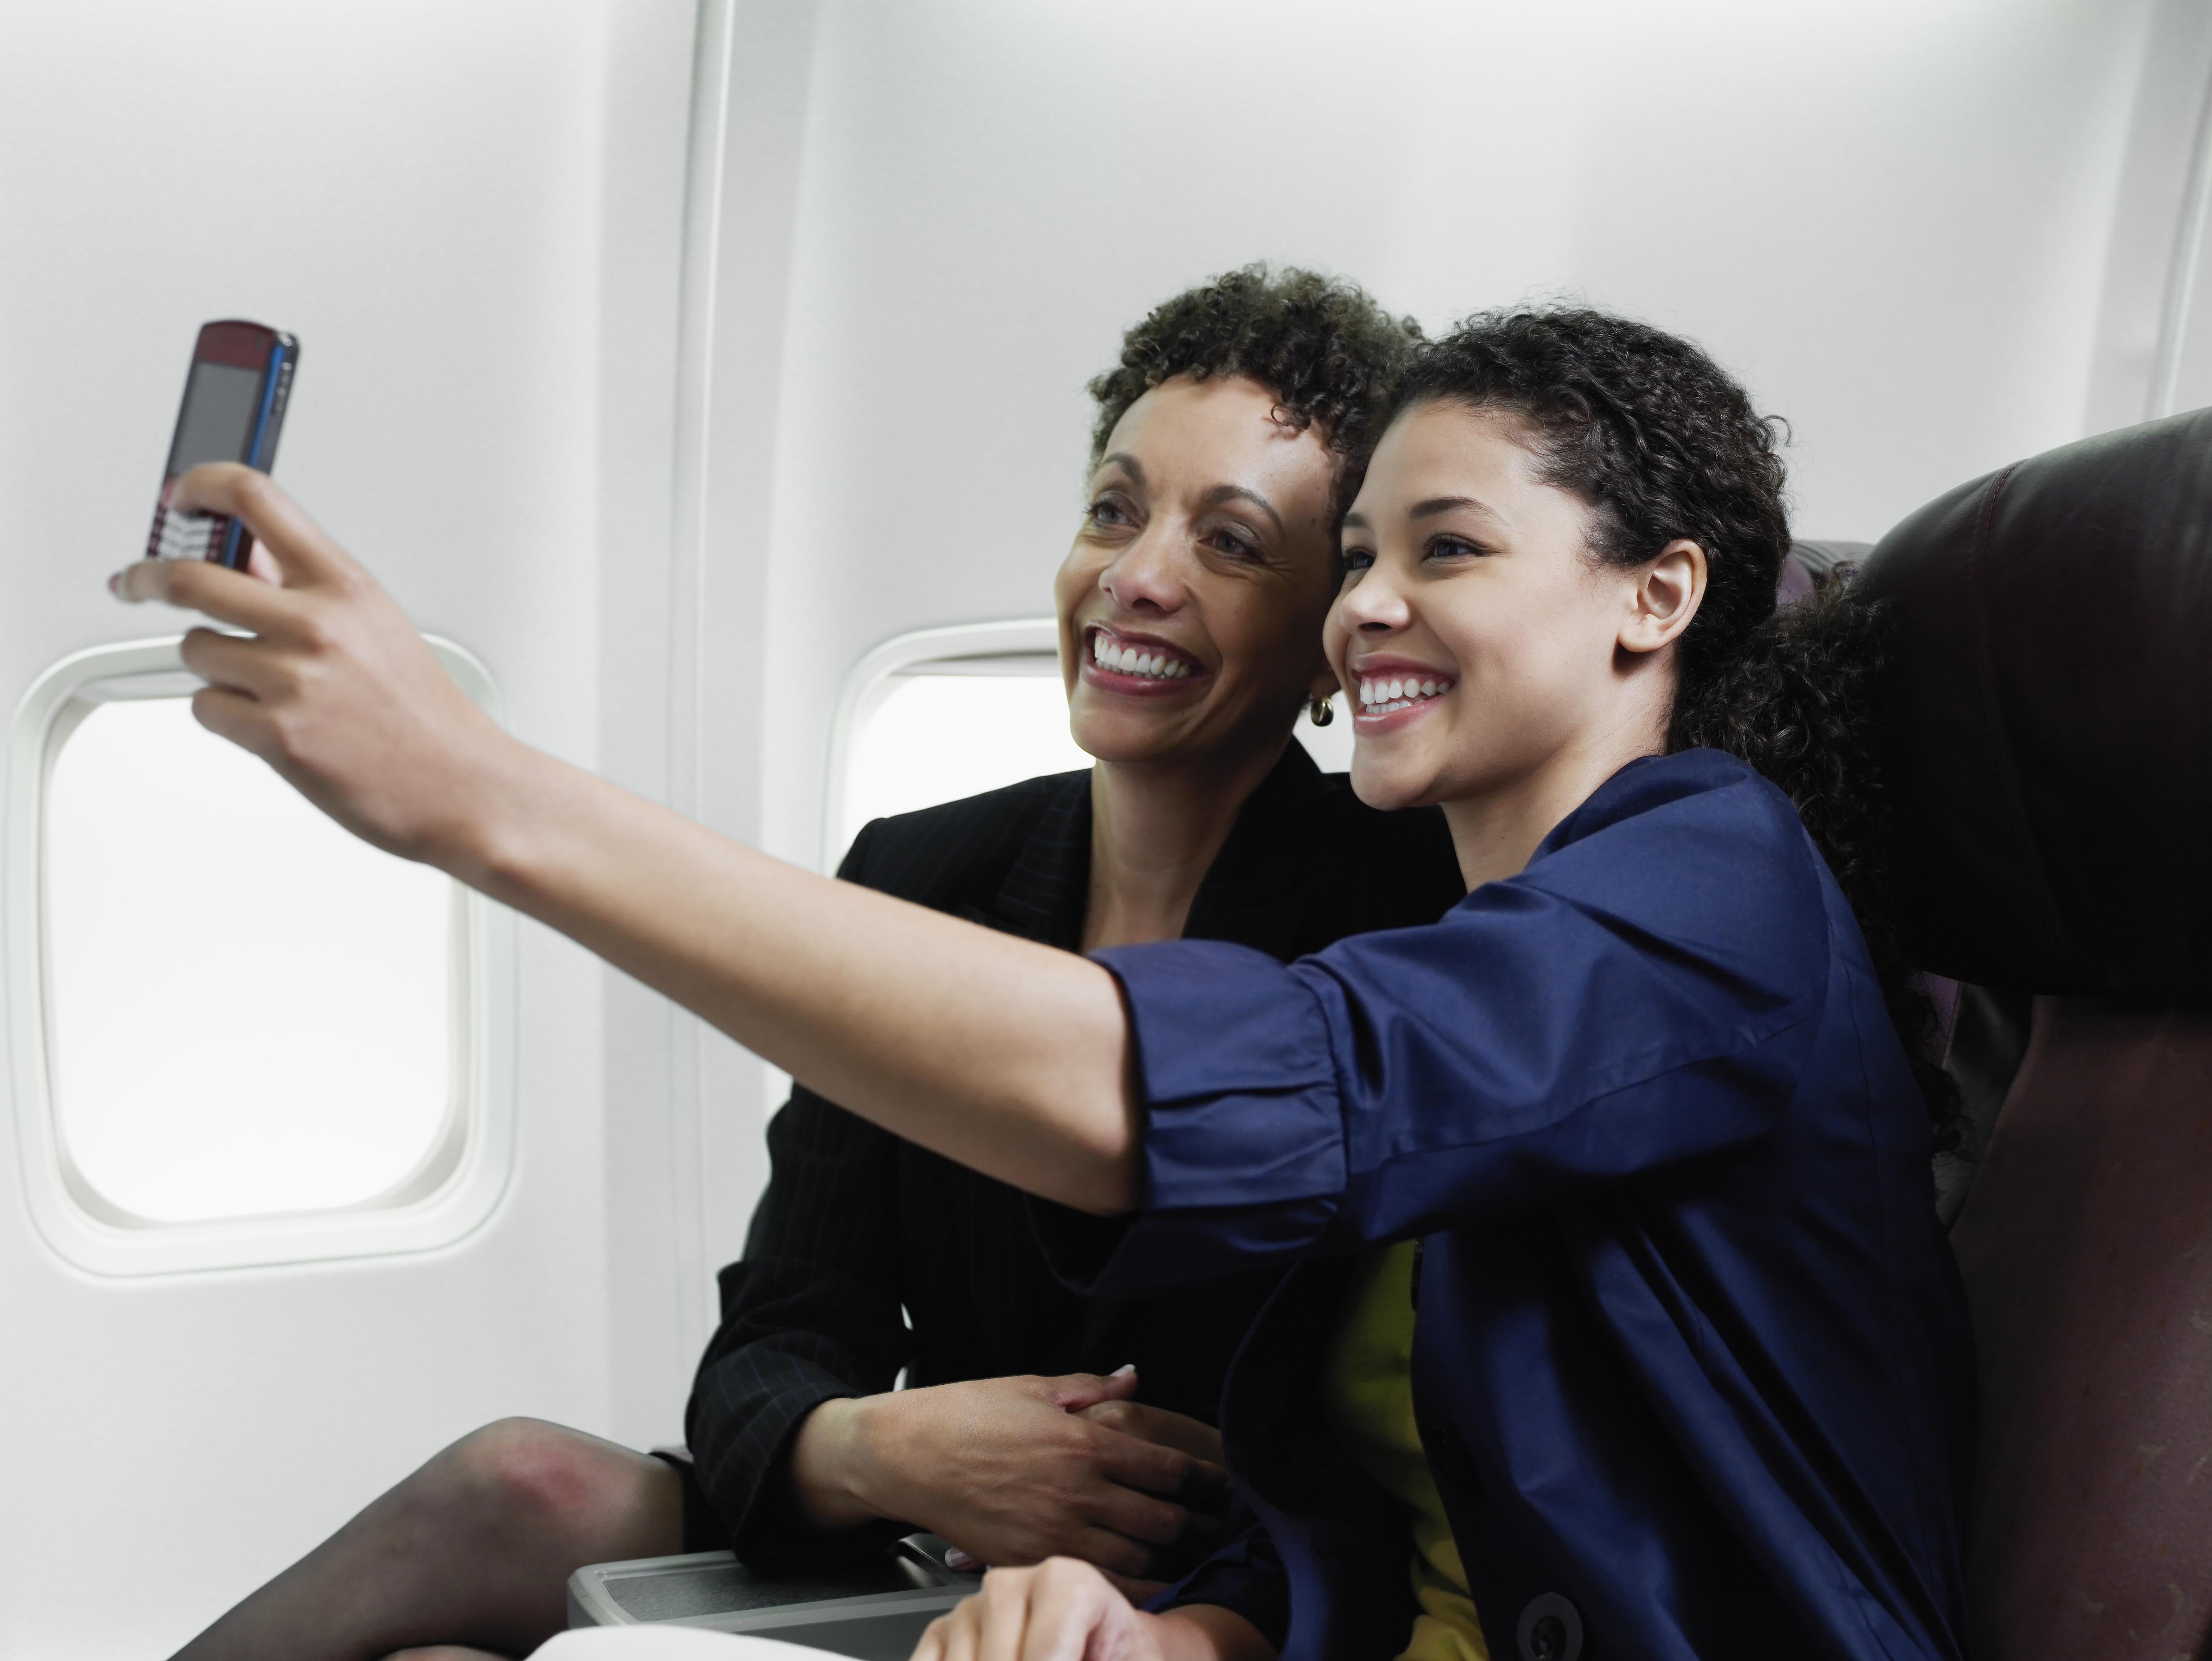 Southwest's Latest Sale Includes International Flights For $69